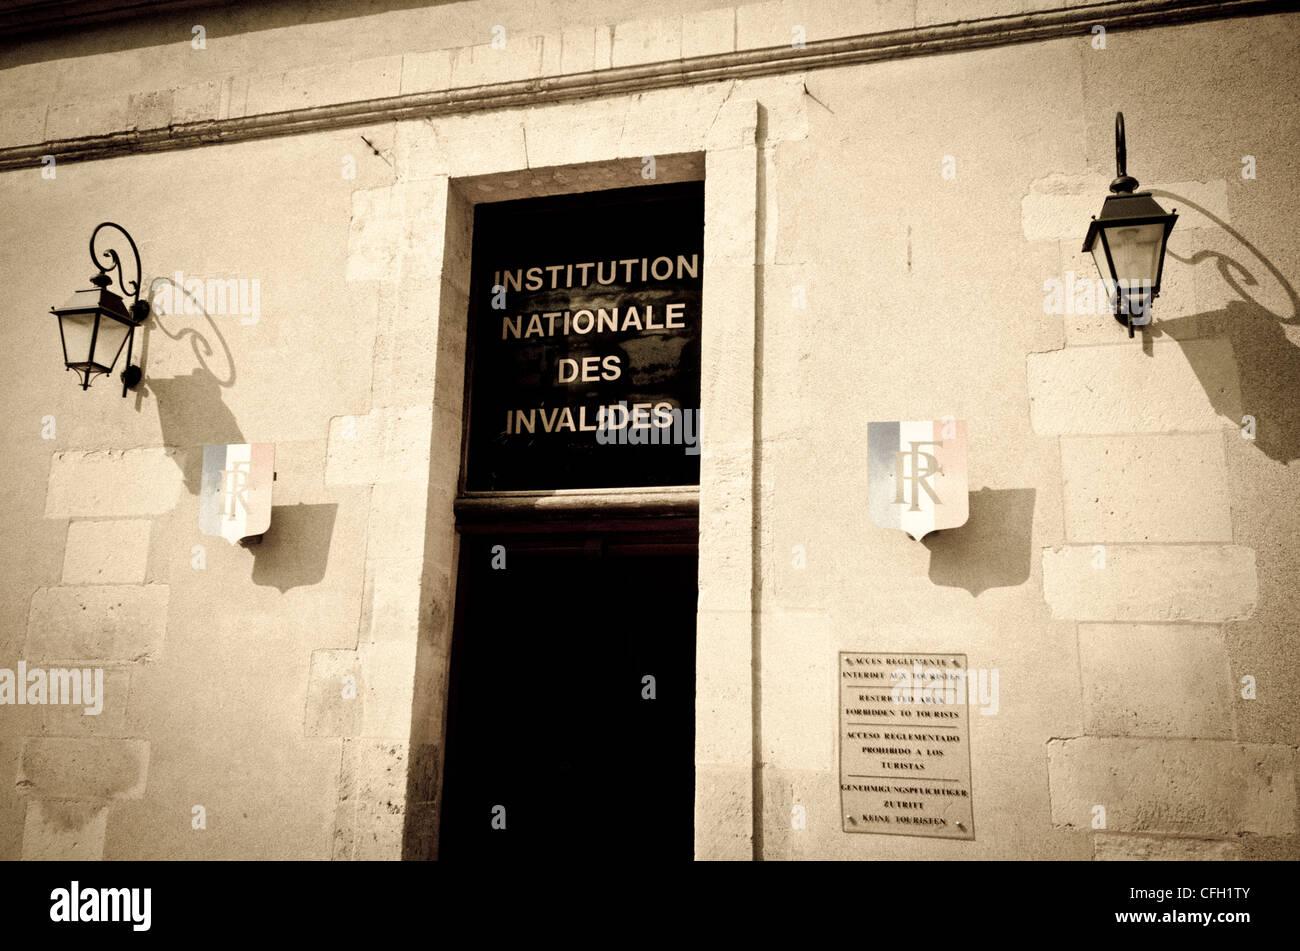 Entrance station at Les Invalides, Paris, France - Stock Image